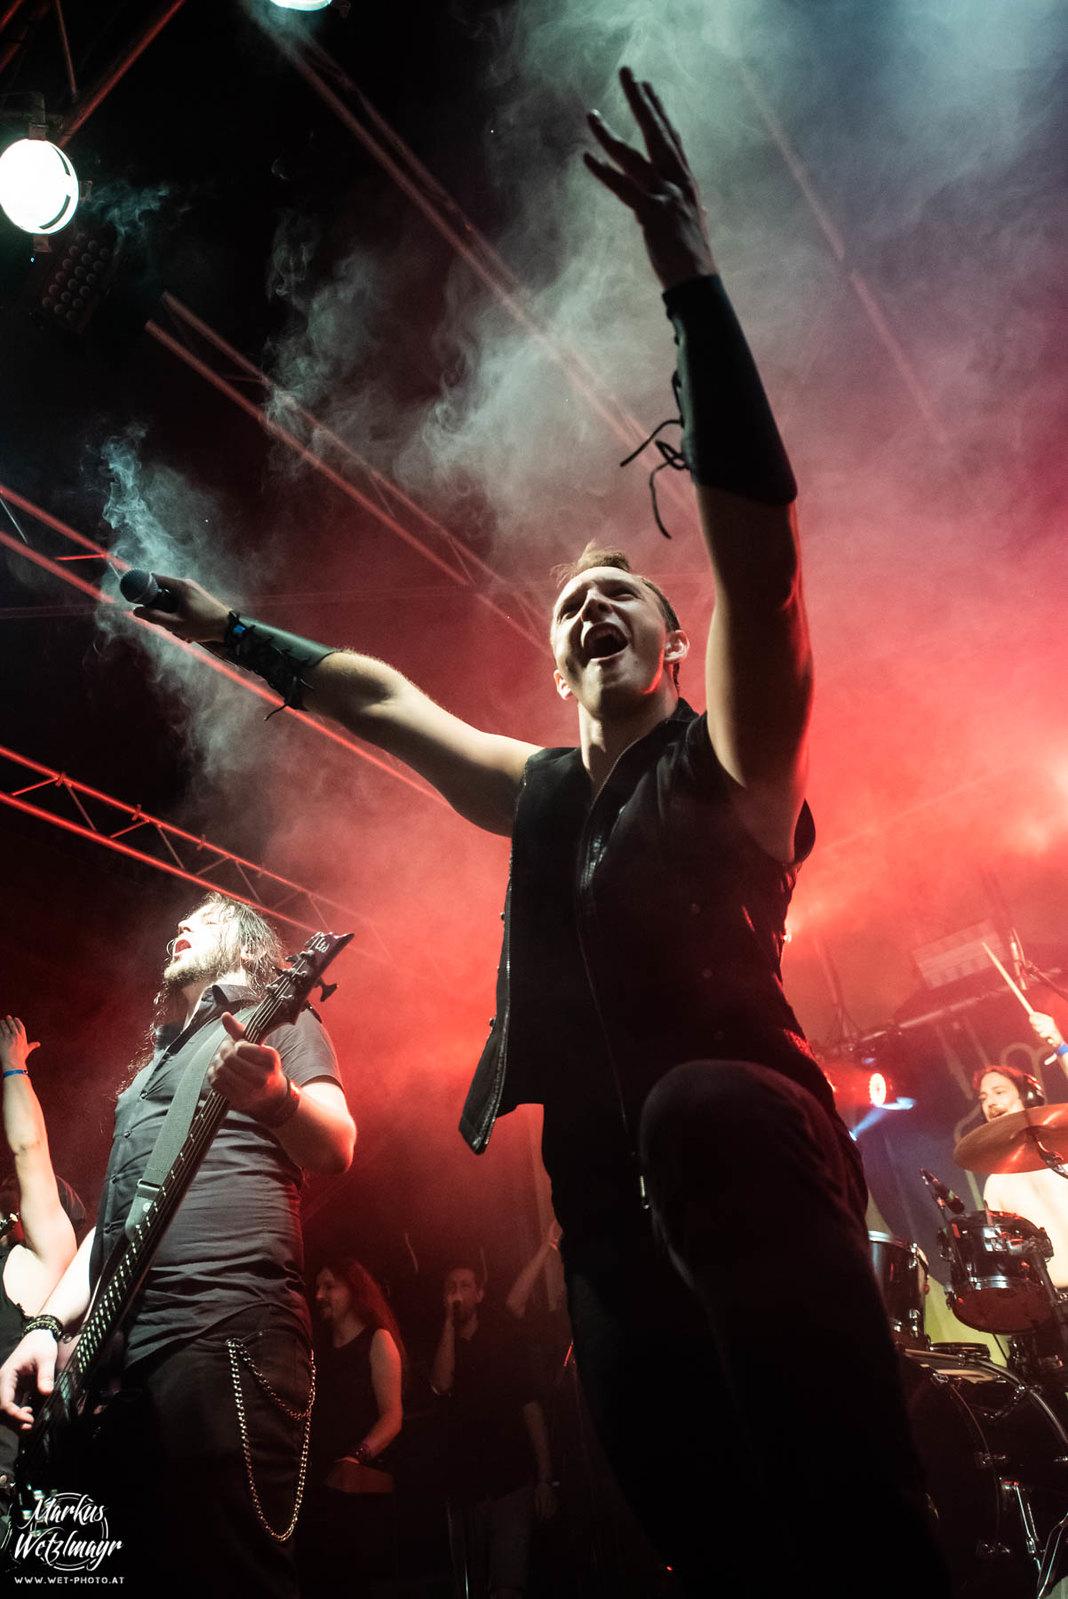 DRAGONY - Metalheads Against Racism Vol. 8, Donauinselfest Vienna